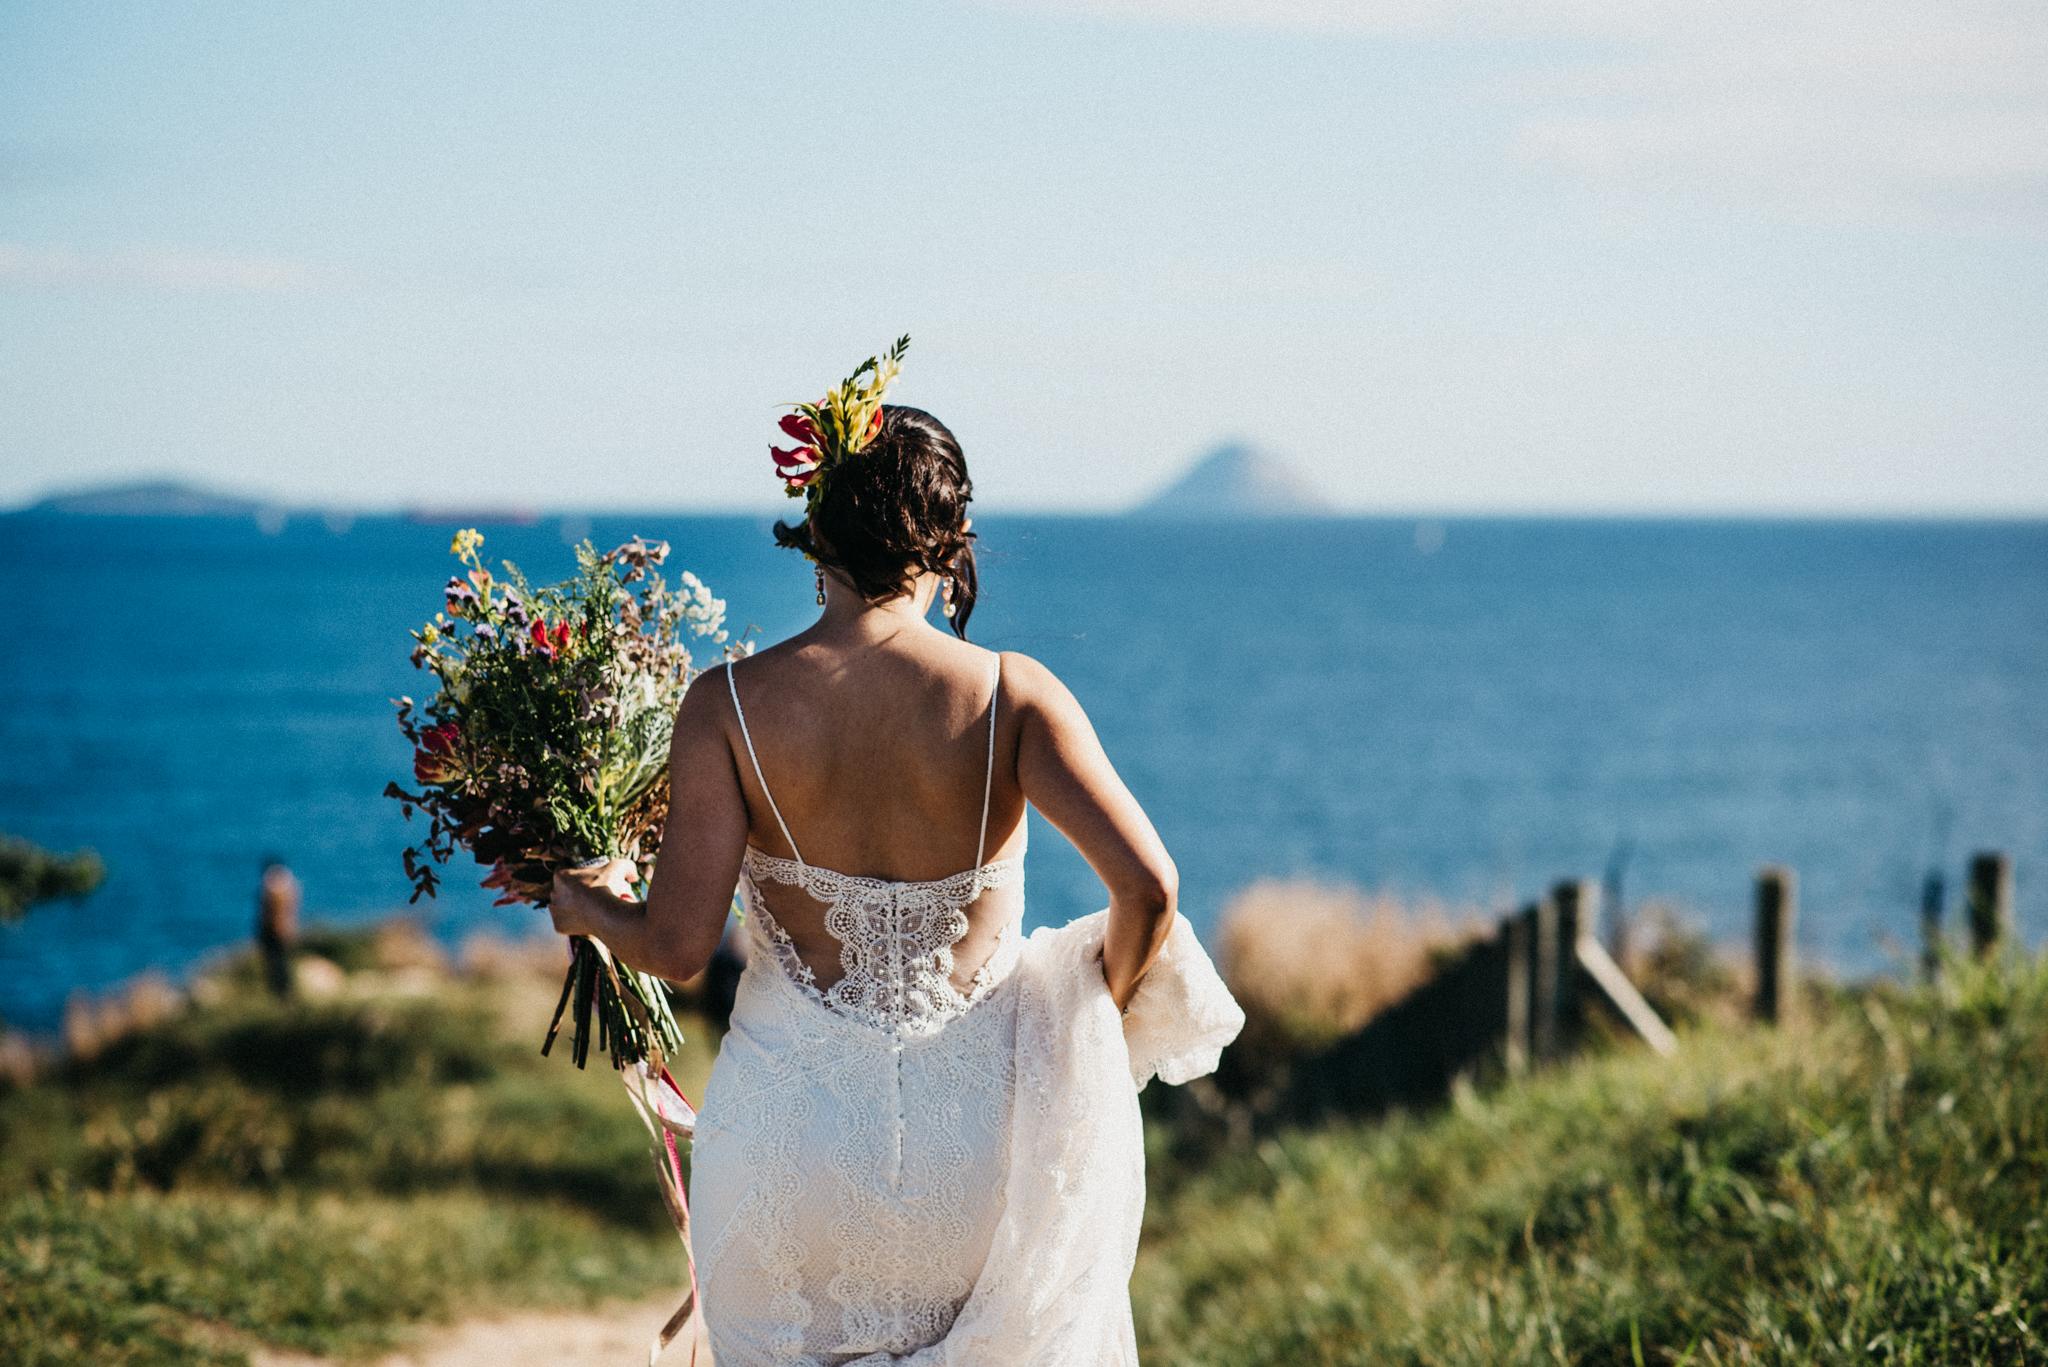 2018.08 Casamento Priscila Barros e Patrizio 0020.jpg